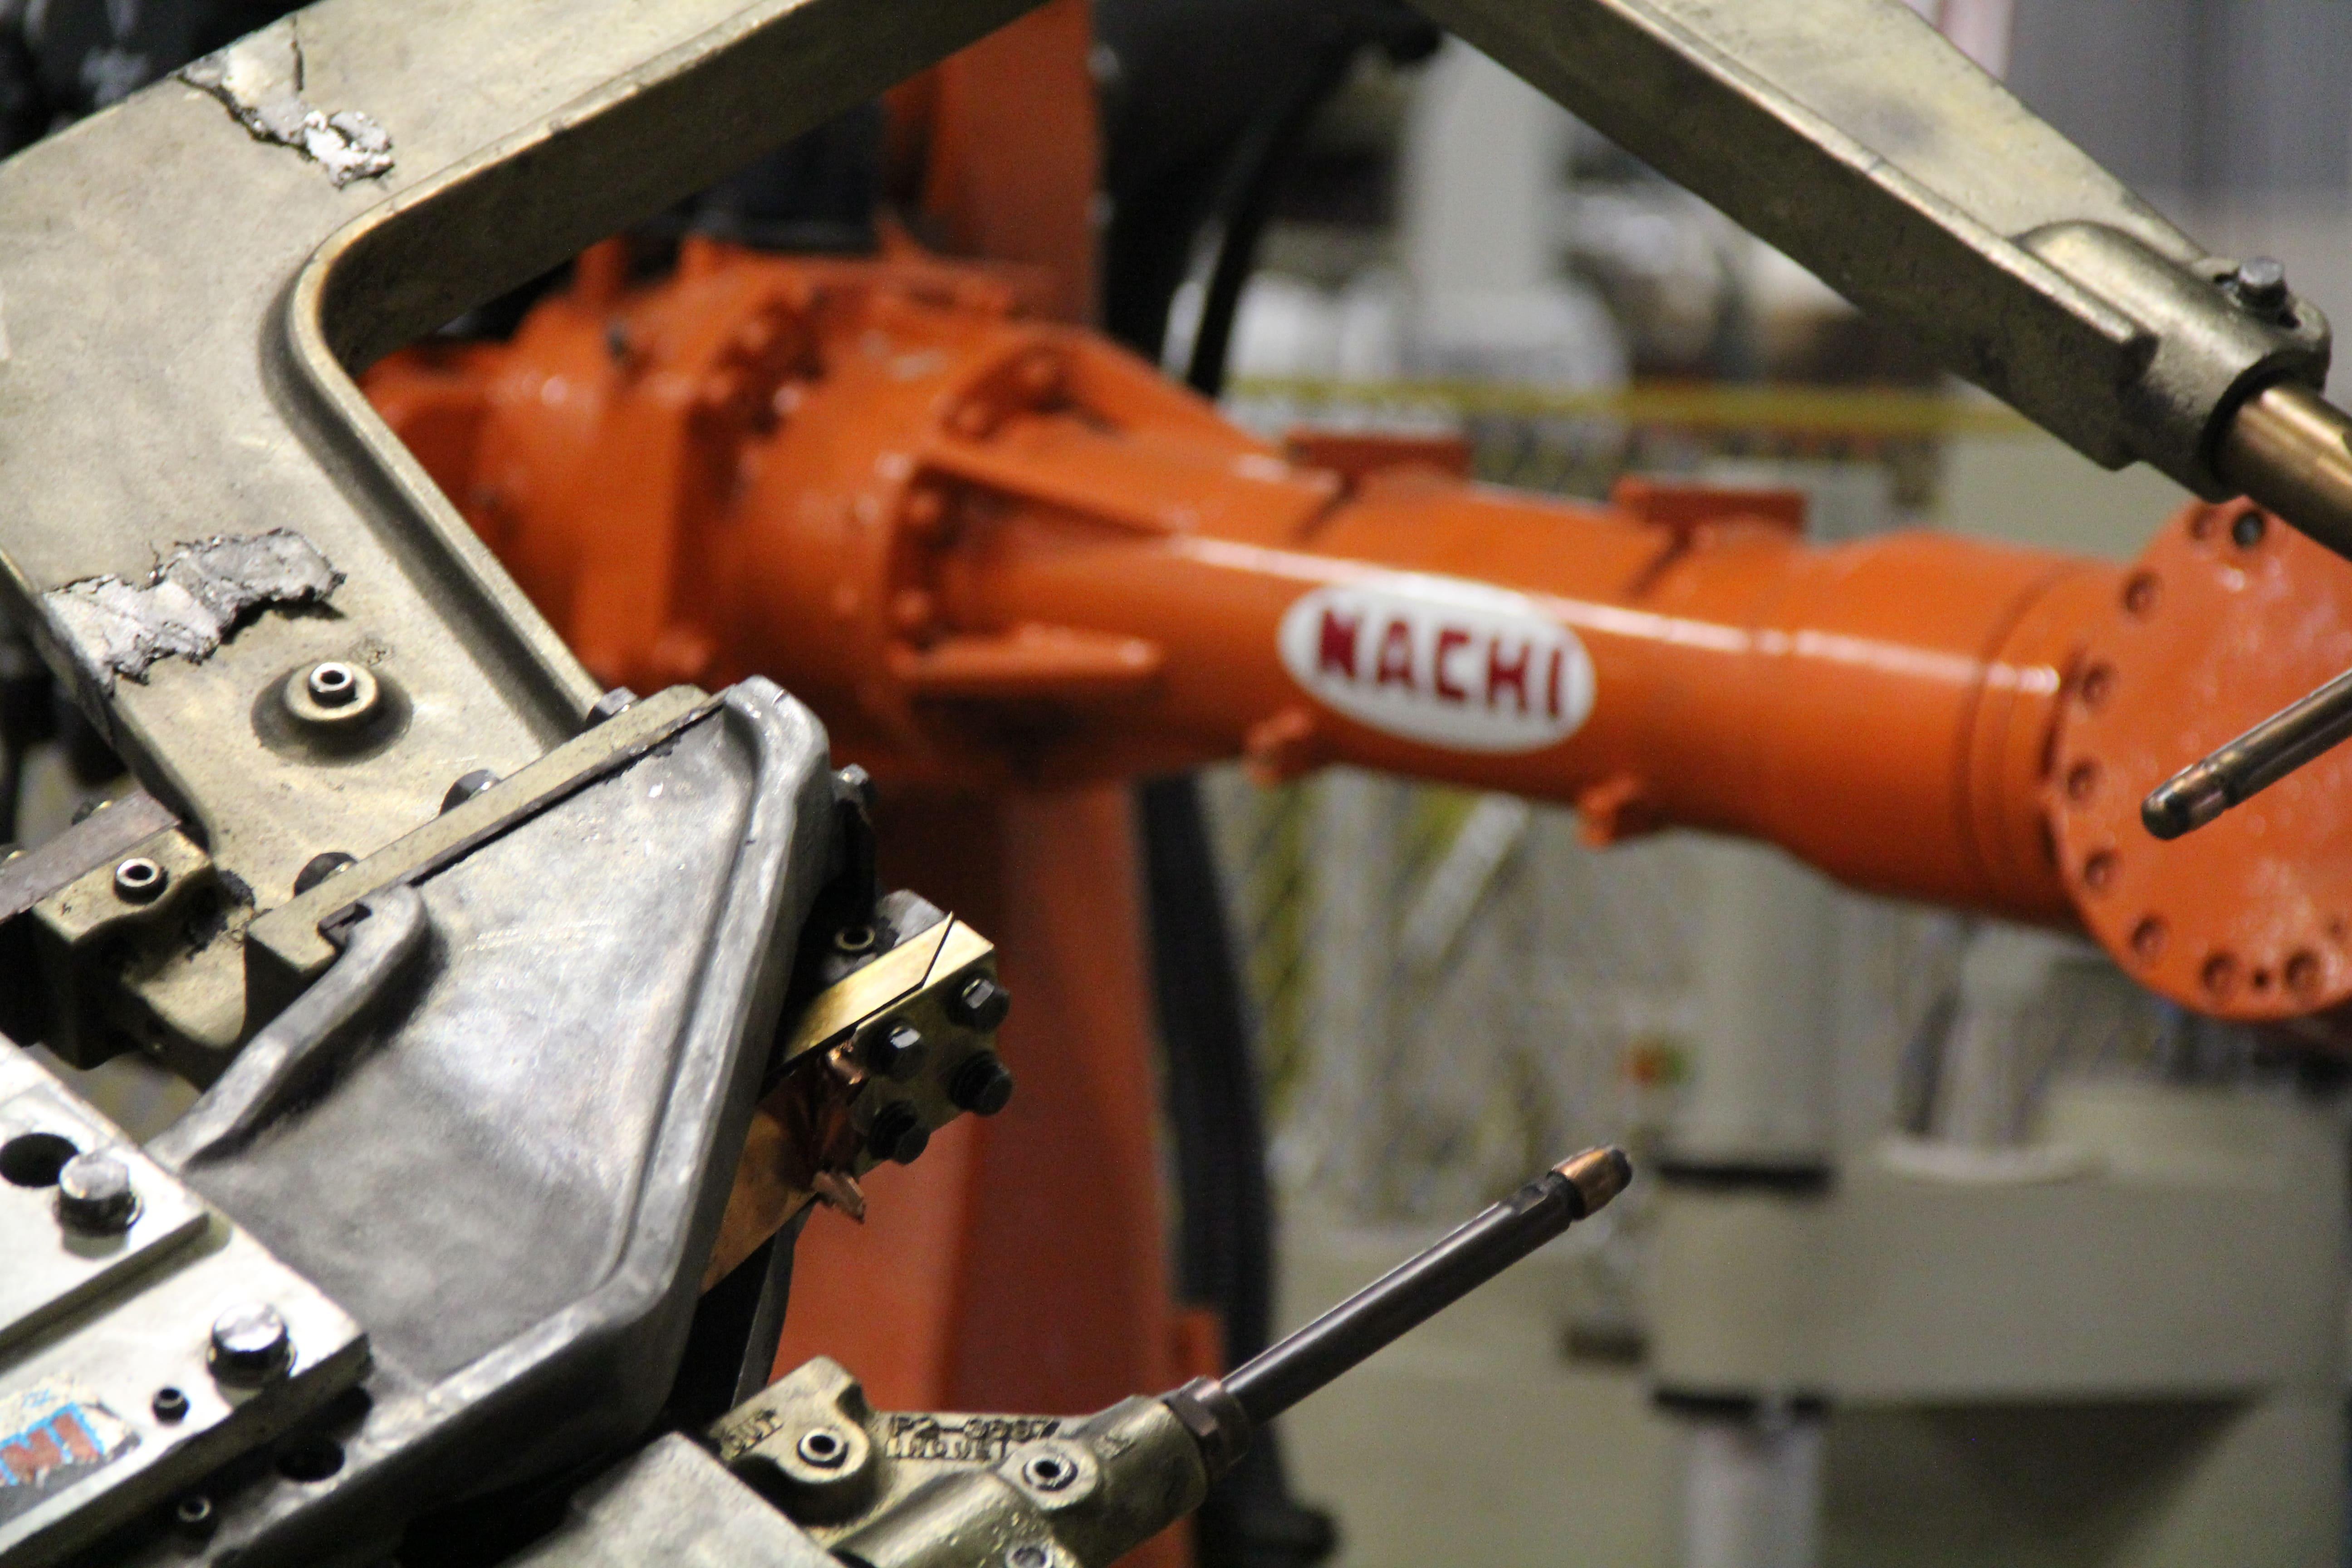 Nachi Aw 11 Controller And Sf166 02 Robotics Testing